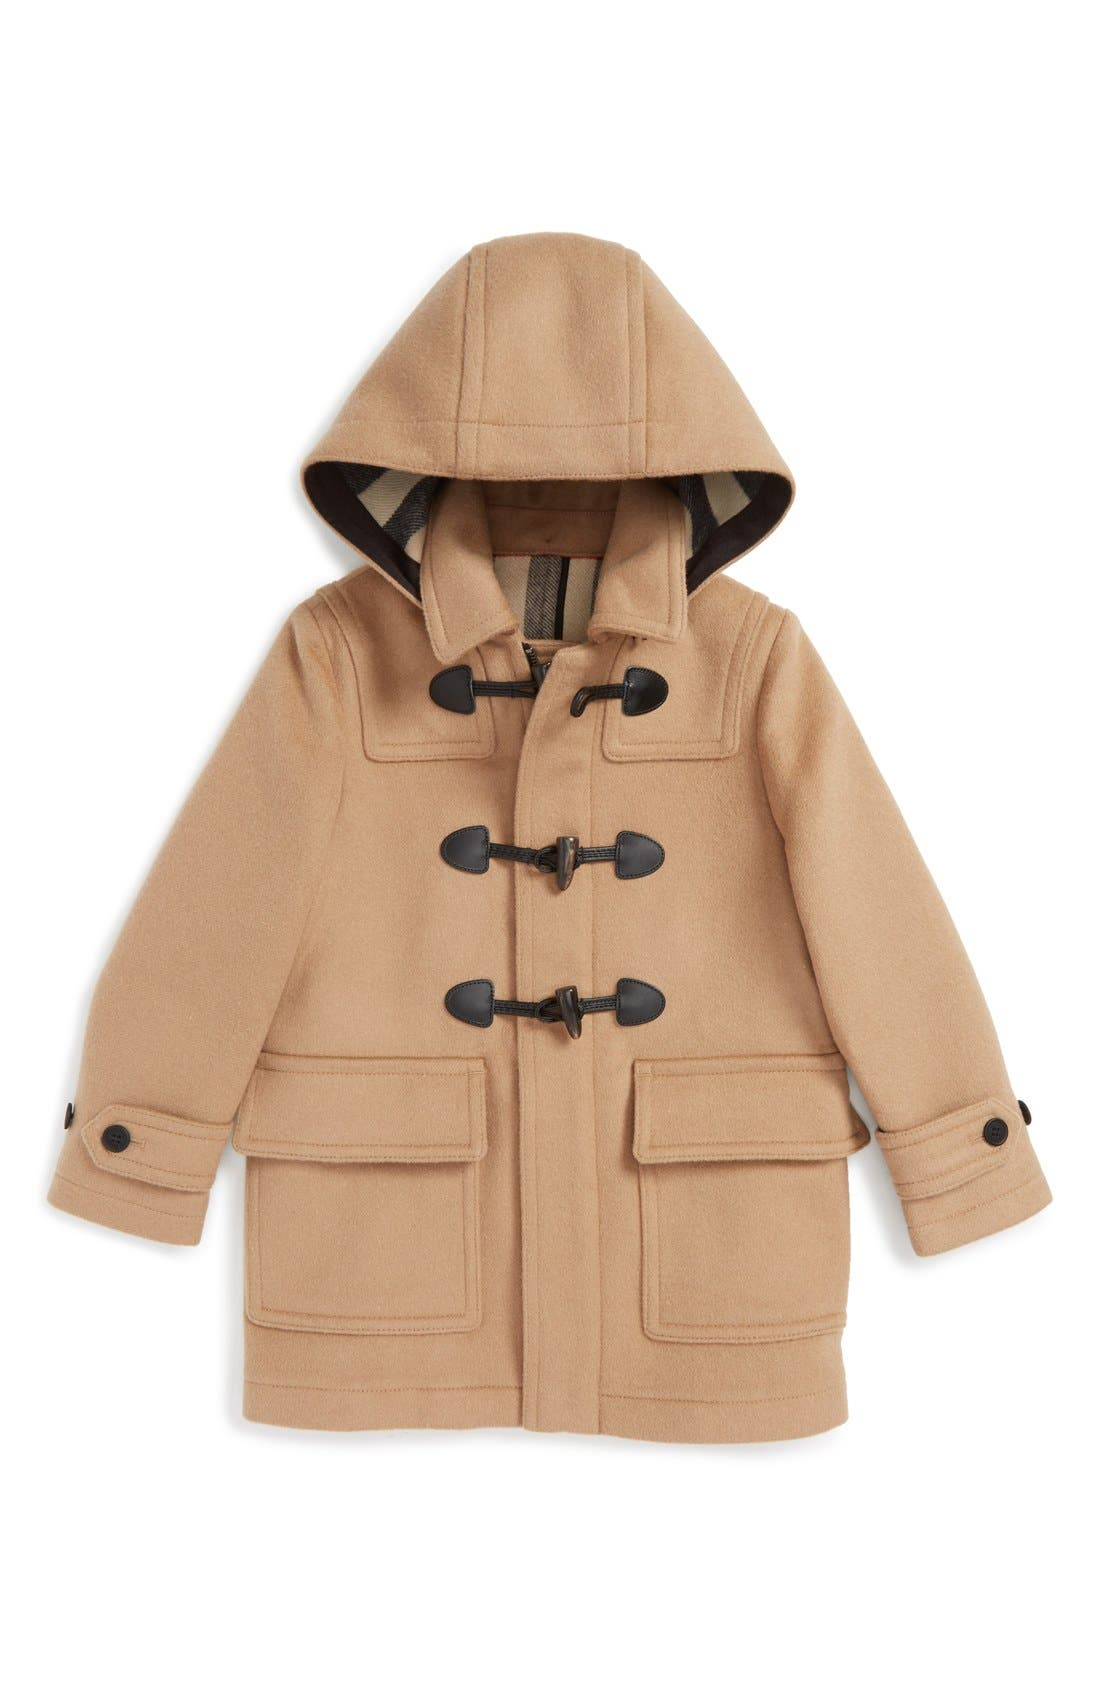 Alternate Image 1 Selected - Burberry 'Burwood' Wool Toggle Coat (Little Boys & Big Boys)